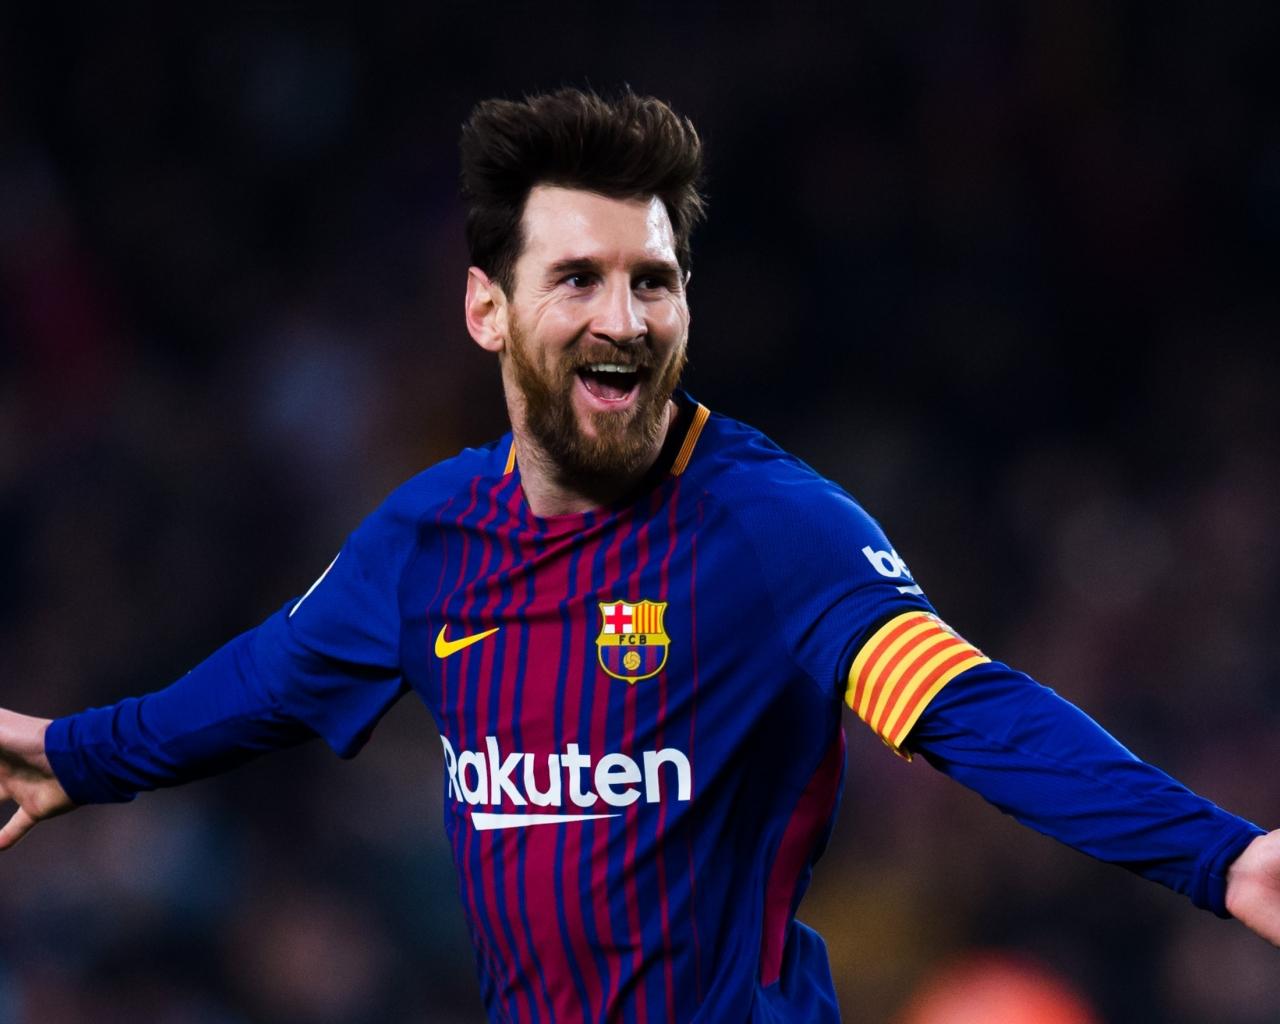 Download 1280x1024 Wallpaper Lionel Messi Celebration Goal Football Sports Standard 5 4 Fullscreen 1280x1024 Hd Image Background 9565